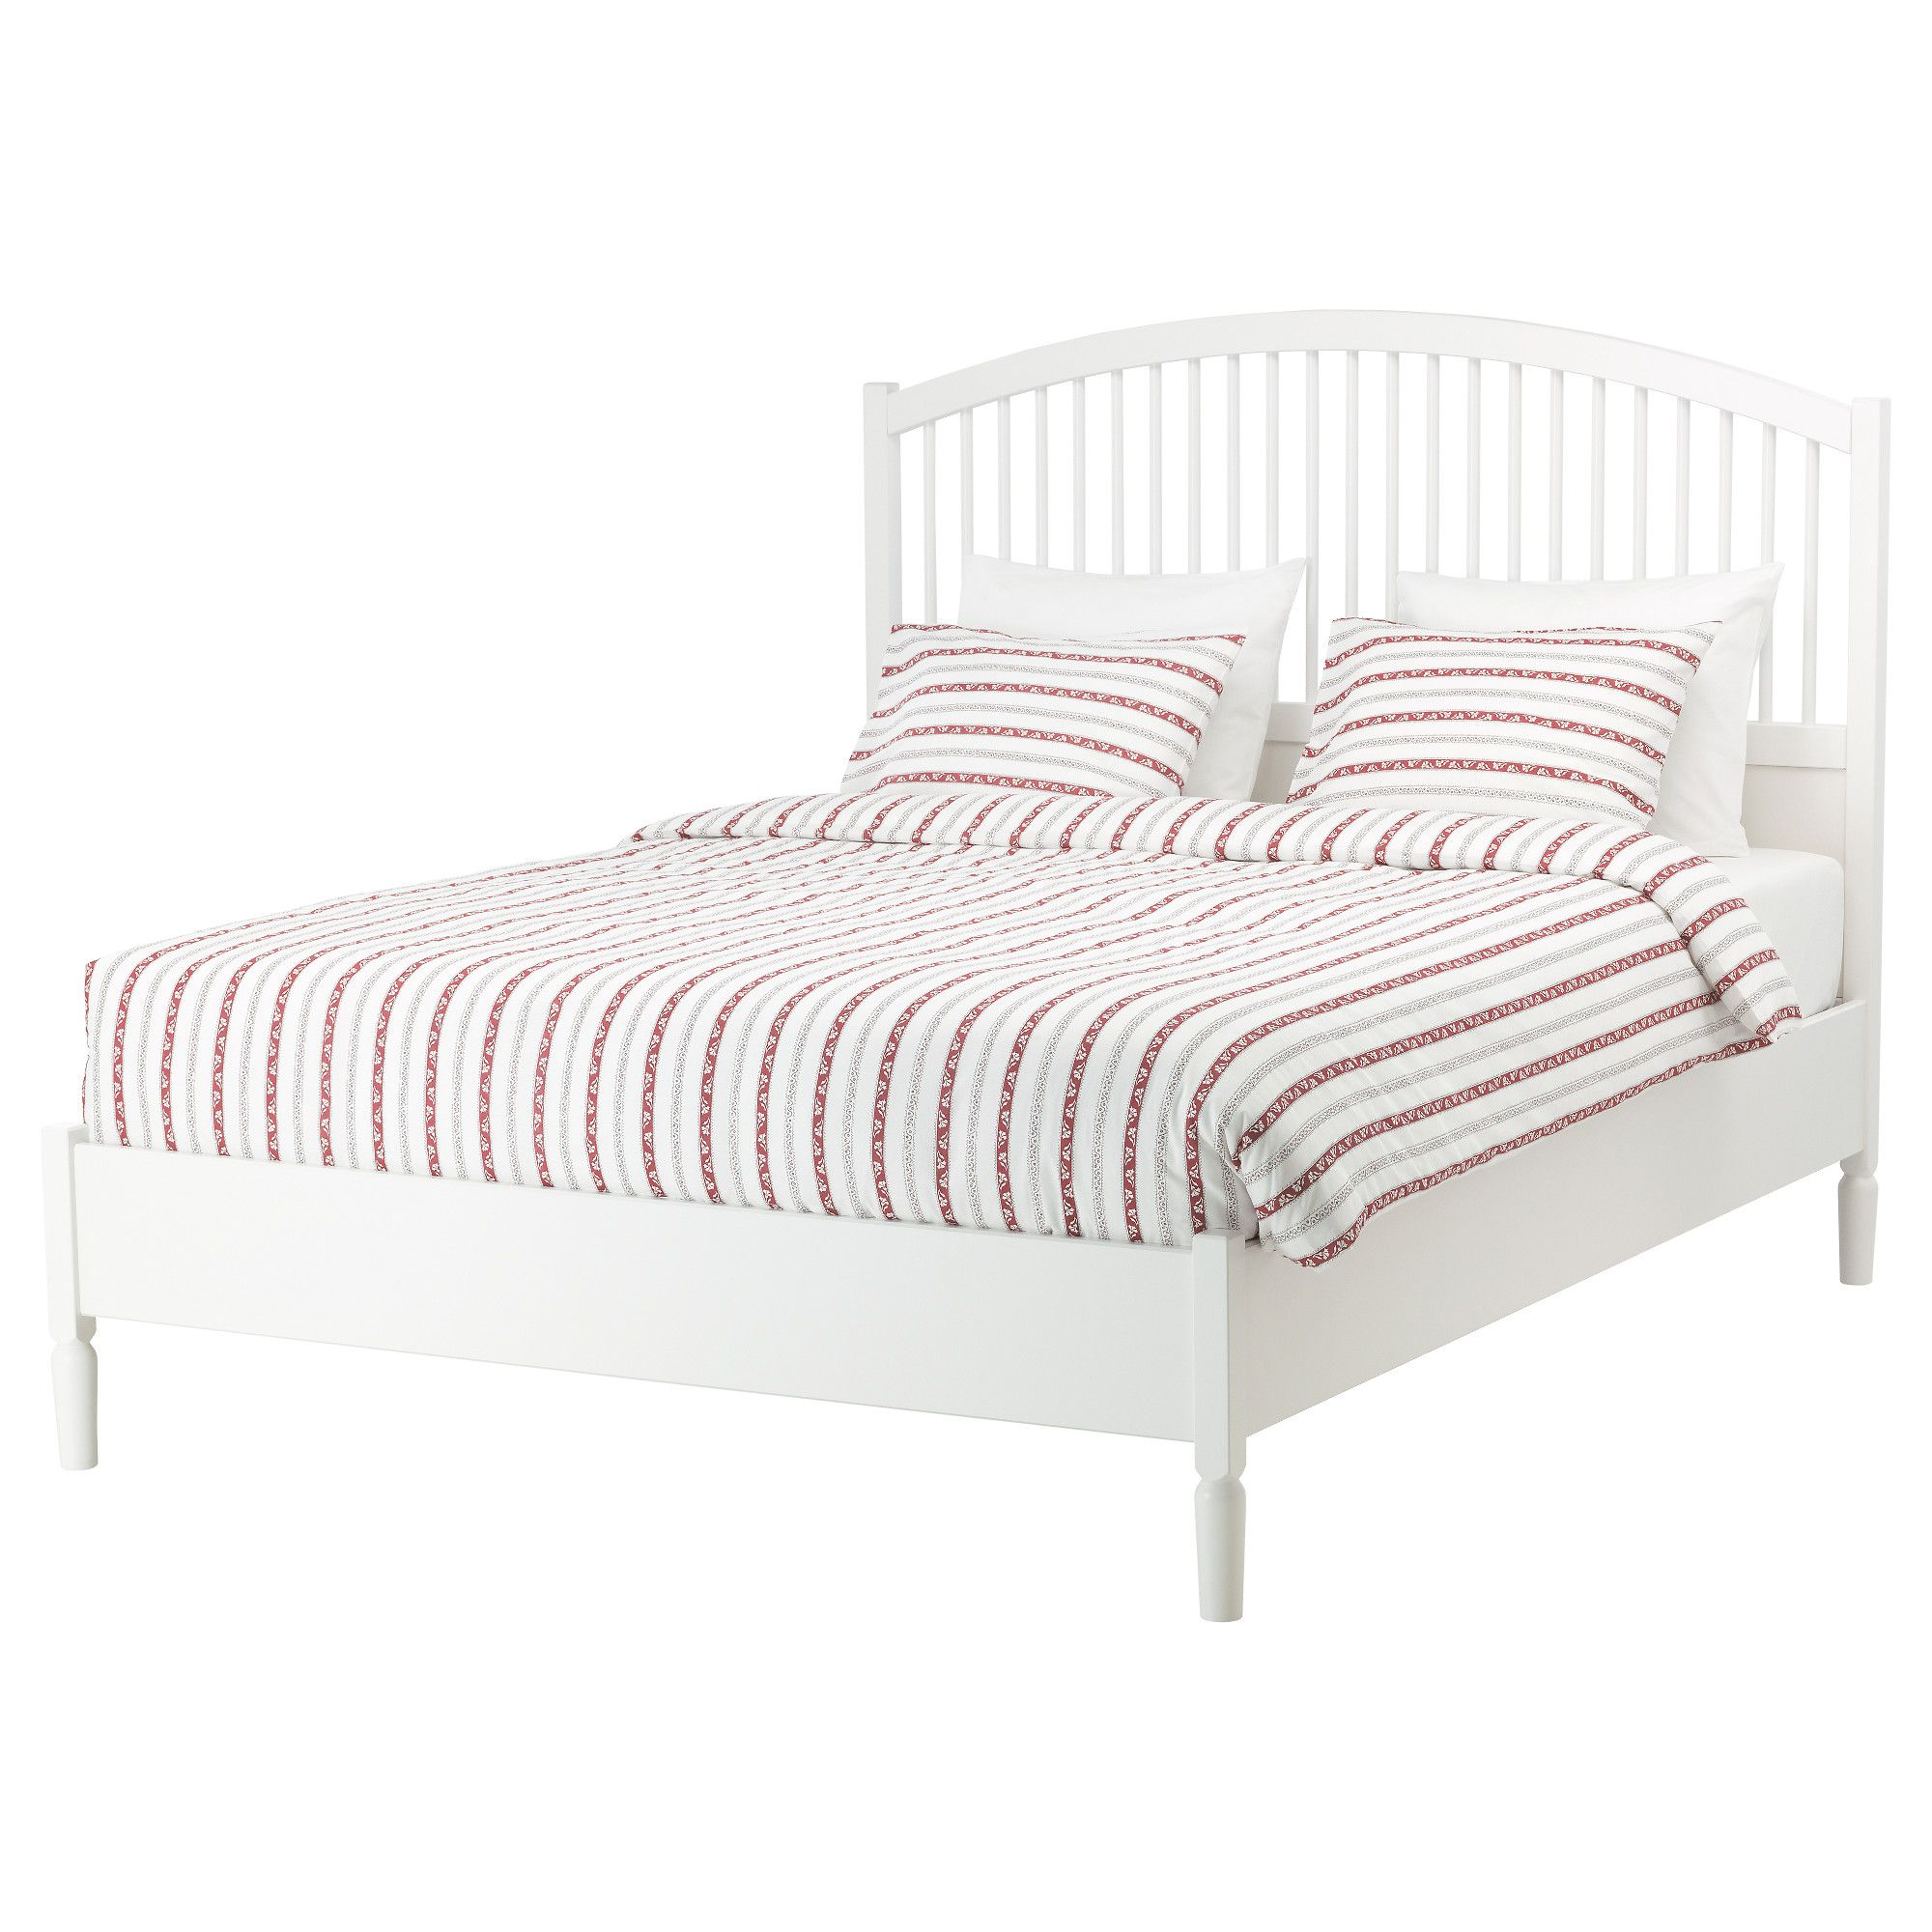 TYSSEDAL Bed frame, white | Bed frames, Adjustable beds and Mattress